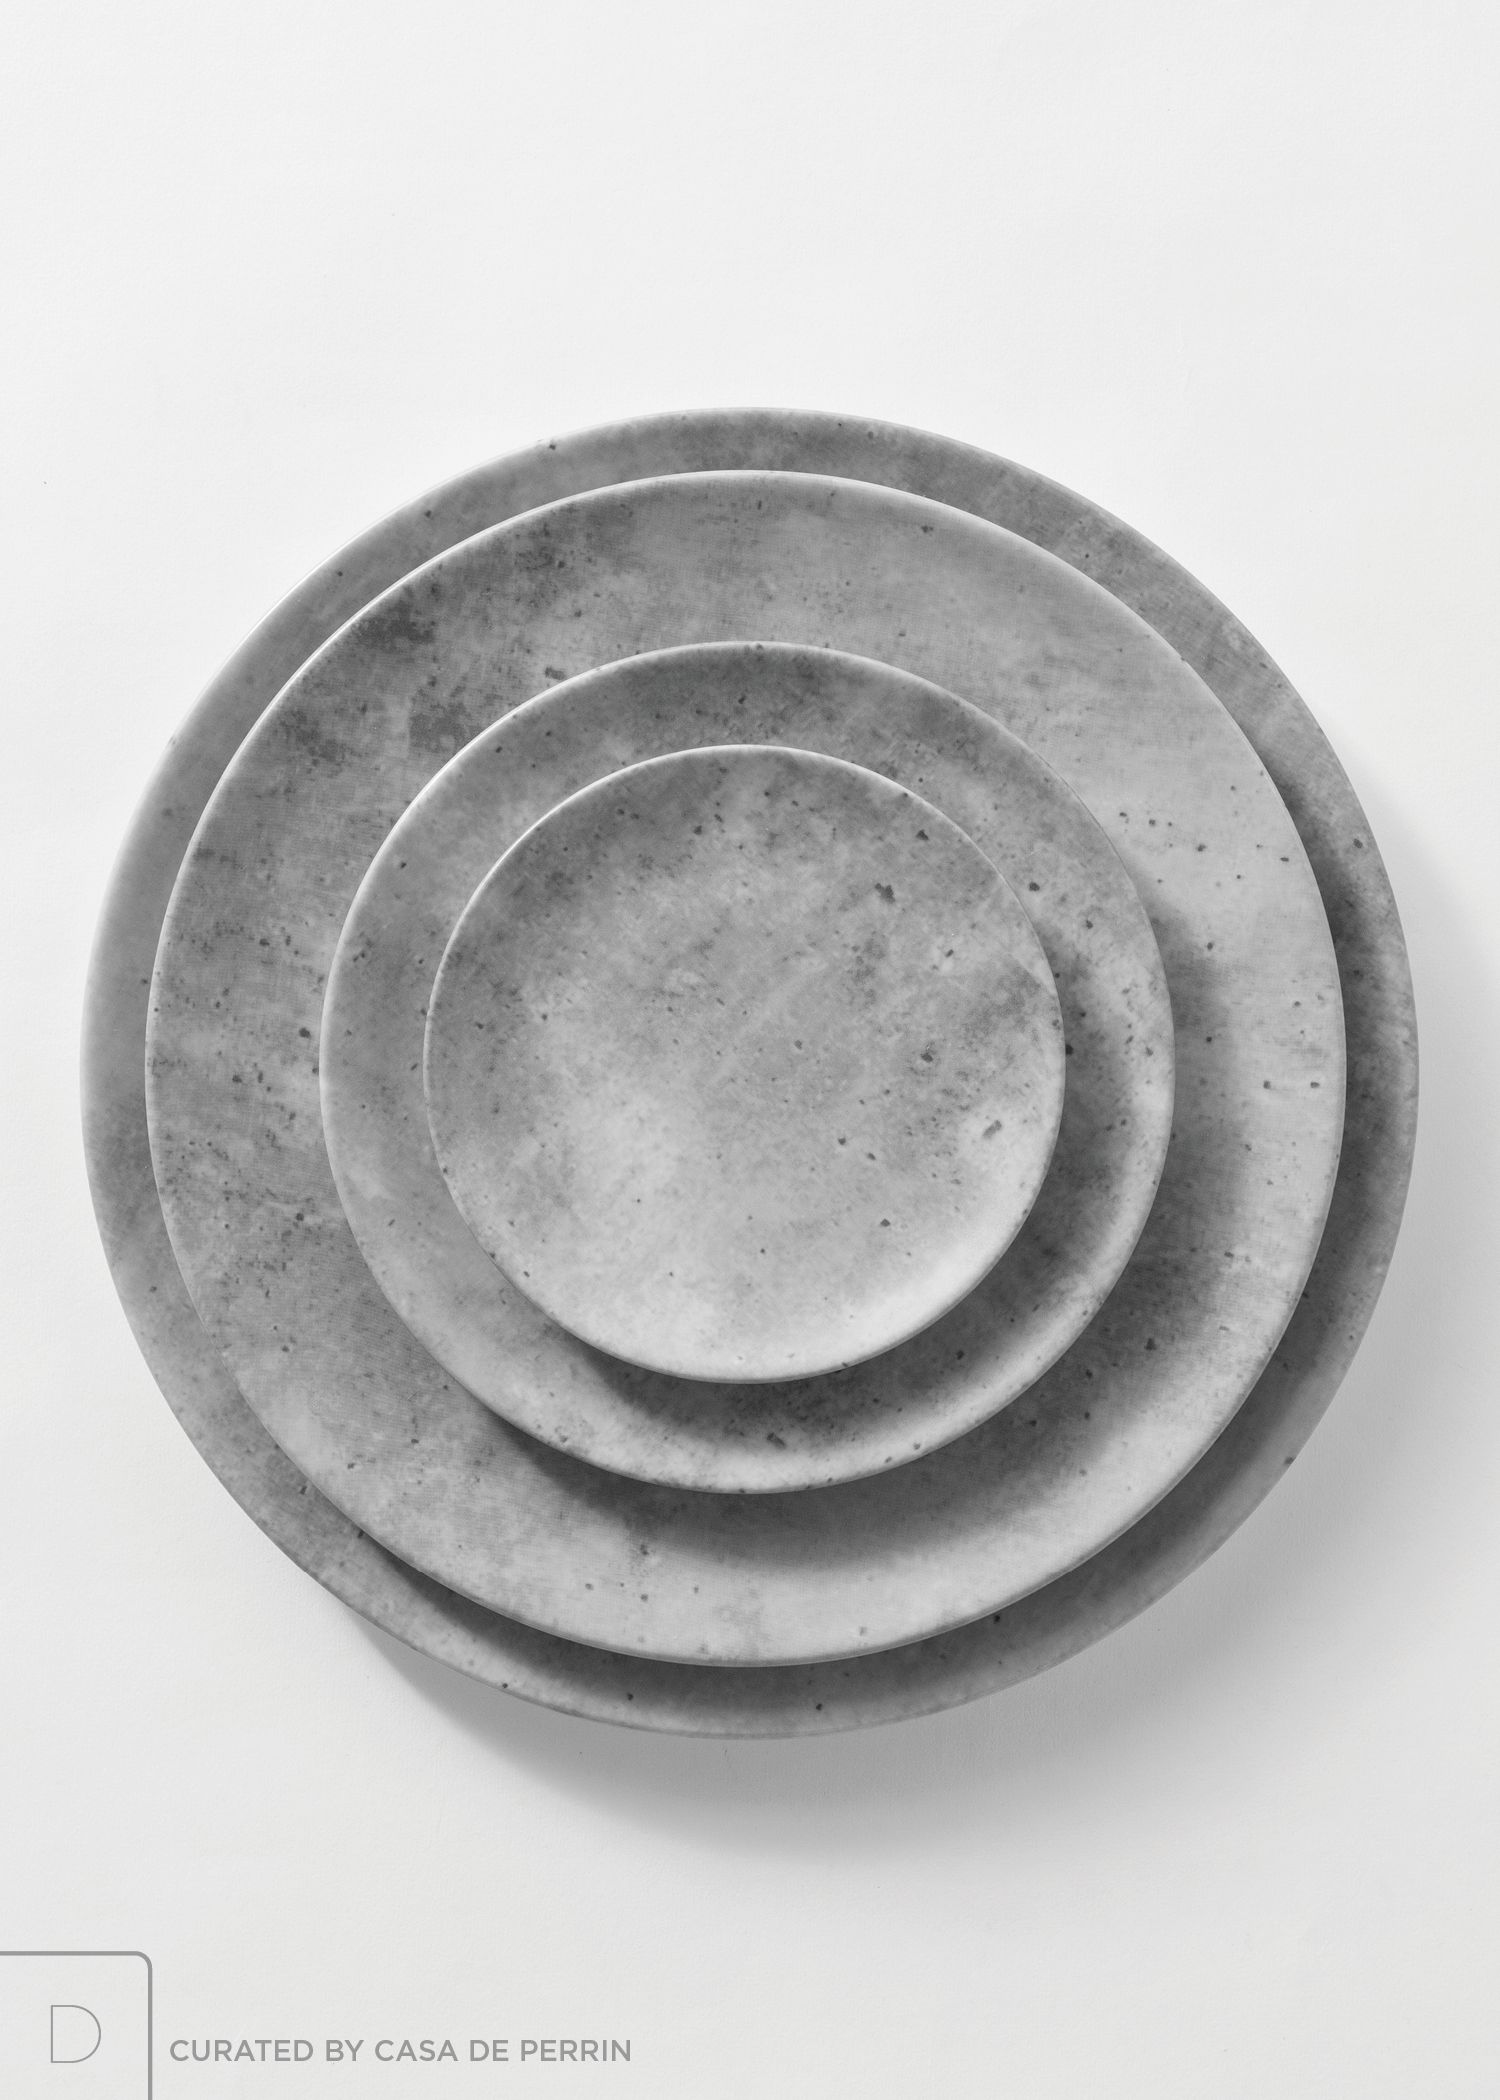 Fine porcelain dinnerware with a matte concrete finish. $14.00 | Charger (12.6 ) $7.00 | Dinner Plate (11u201d) $6.00 | Salad/Dessert Plate (7.9 ) $4.00 ... & Fine porcelain dinnerware with a matte concrete finish. $14.00 ...